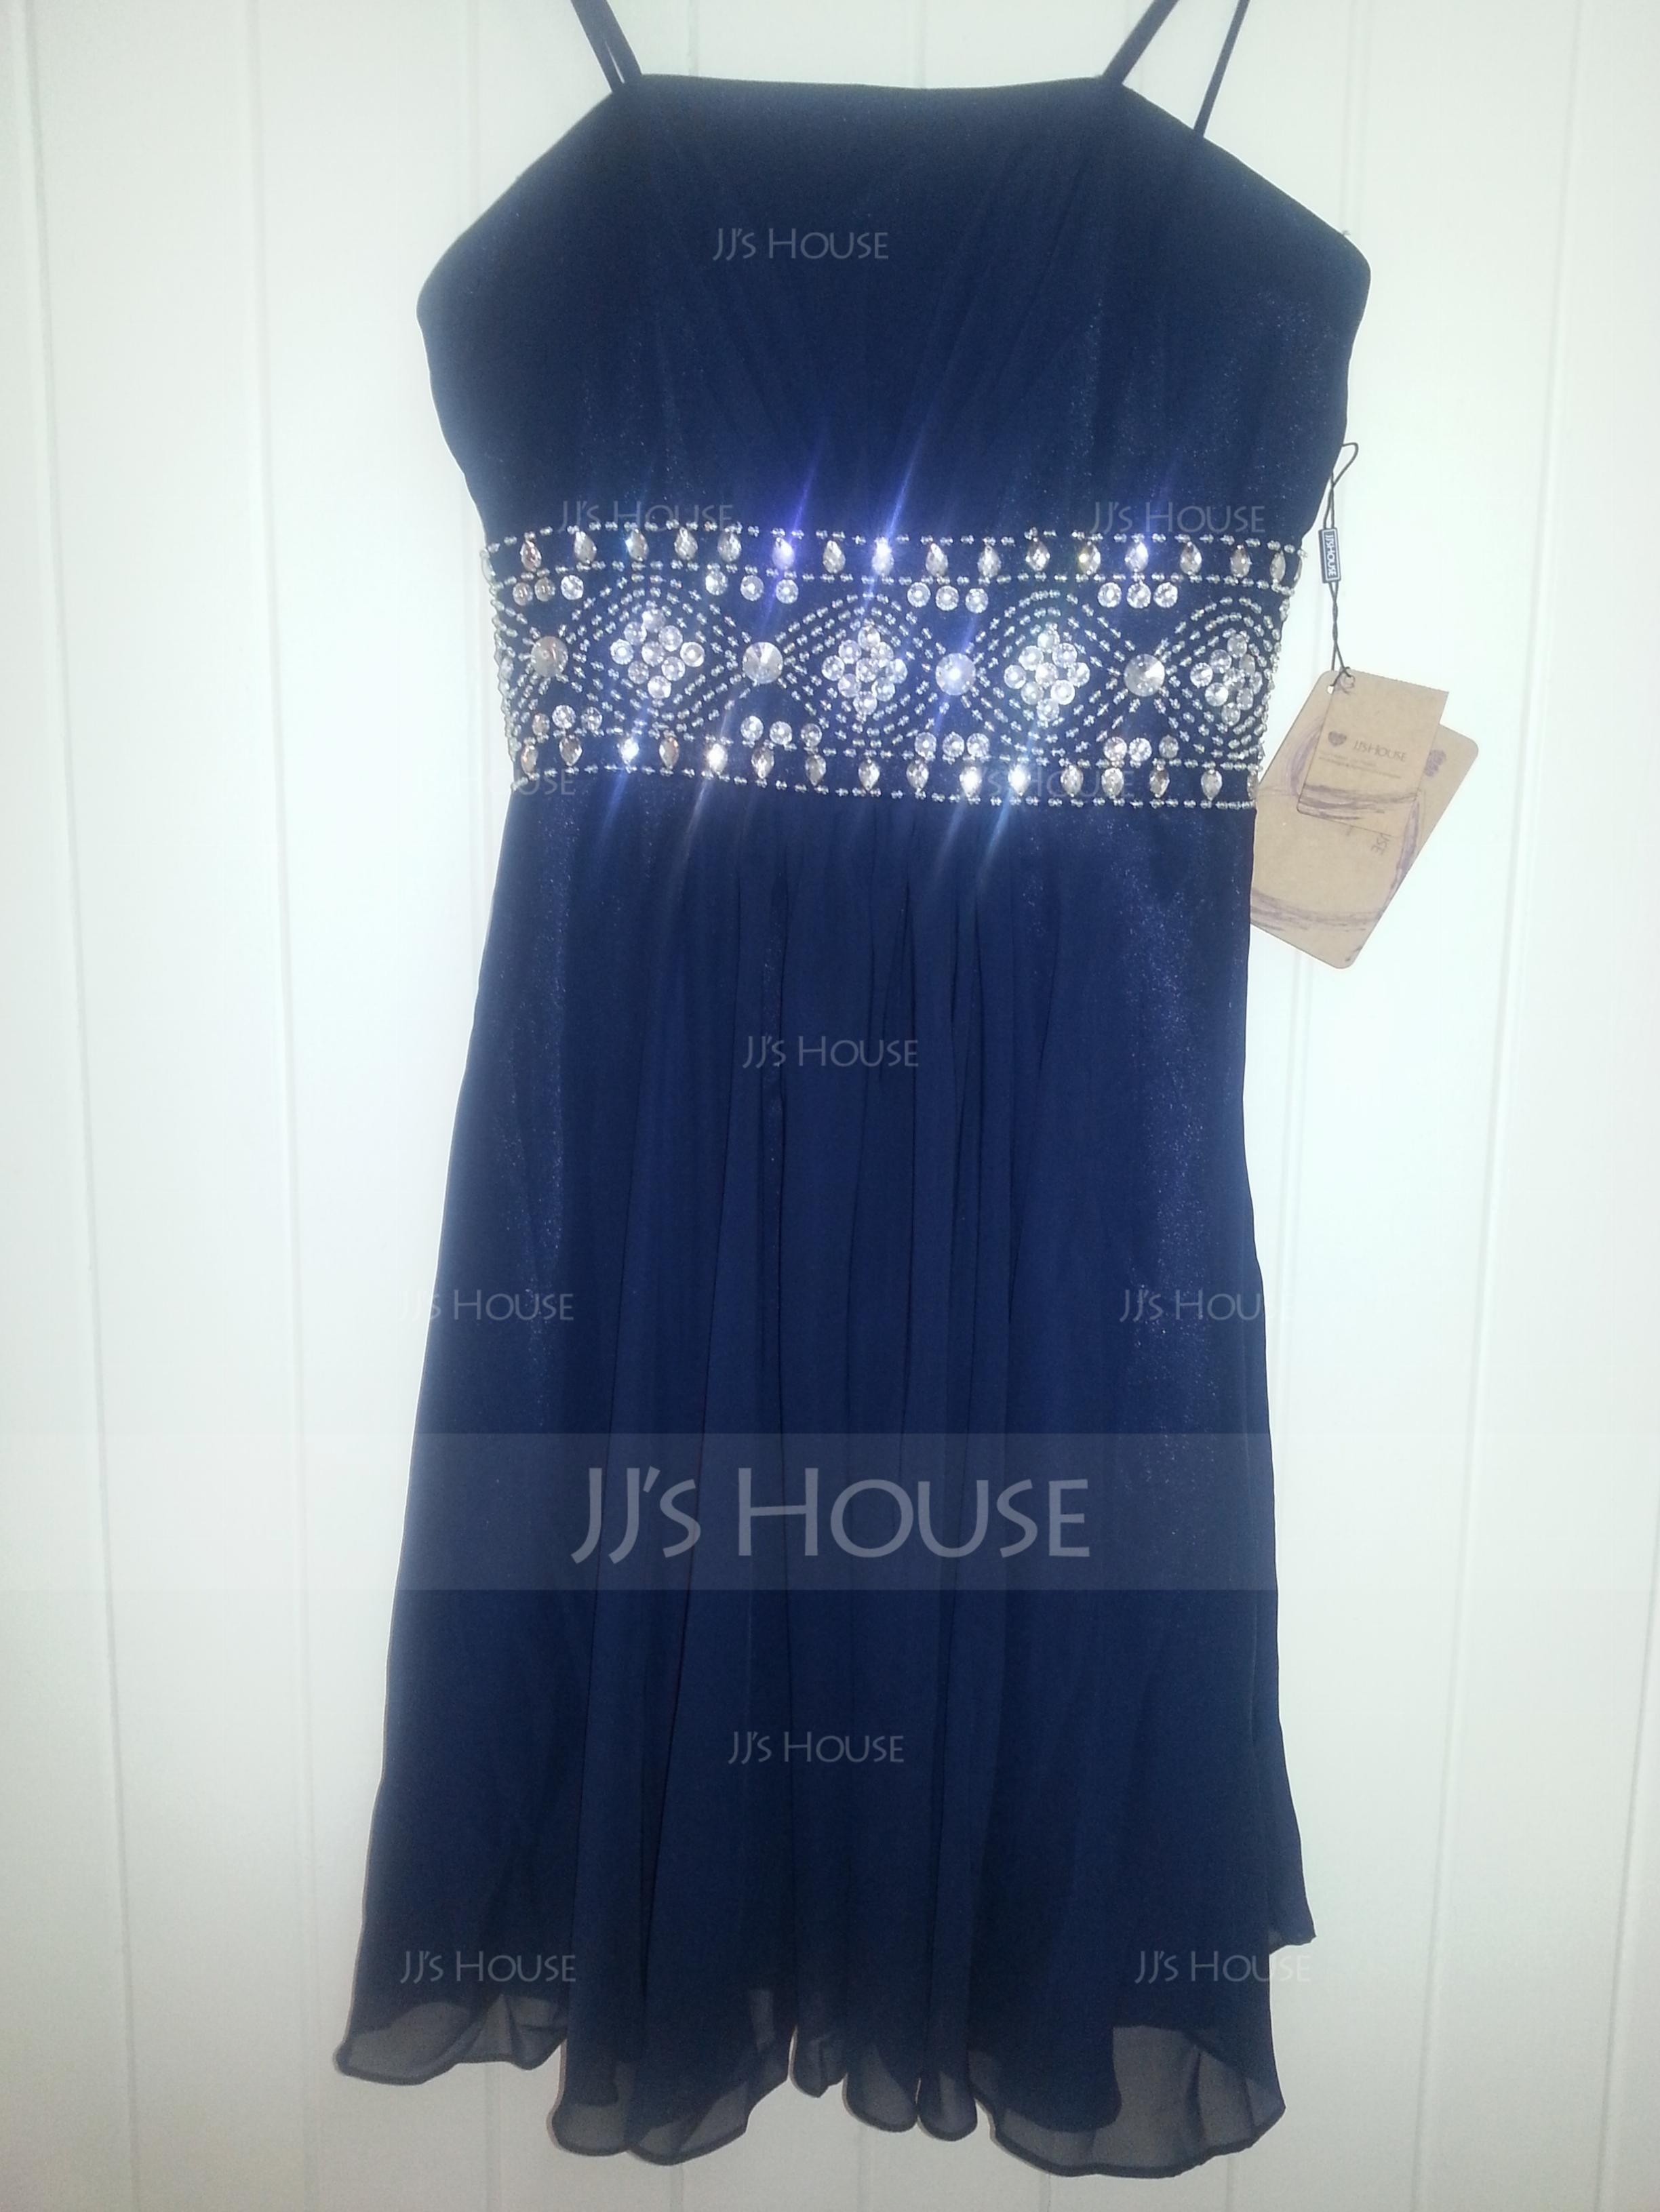 A-Line/Princess Knee-Length Chiffon Homecoming Dress With Ruffle Beading (022020610)